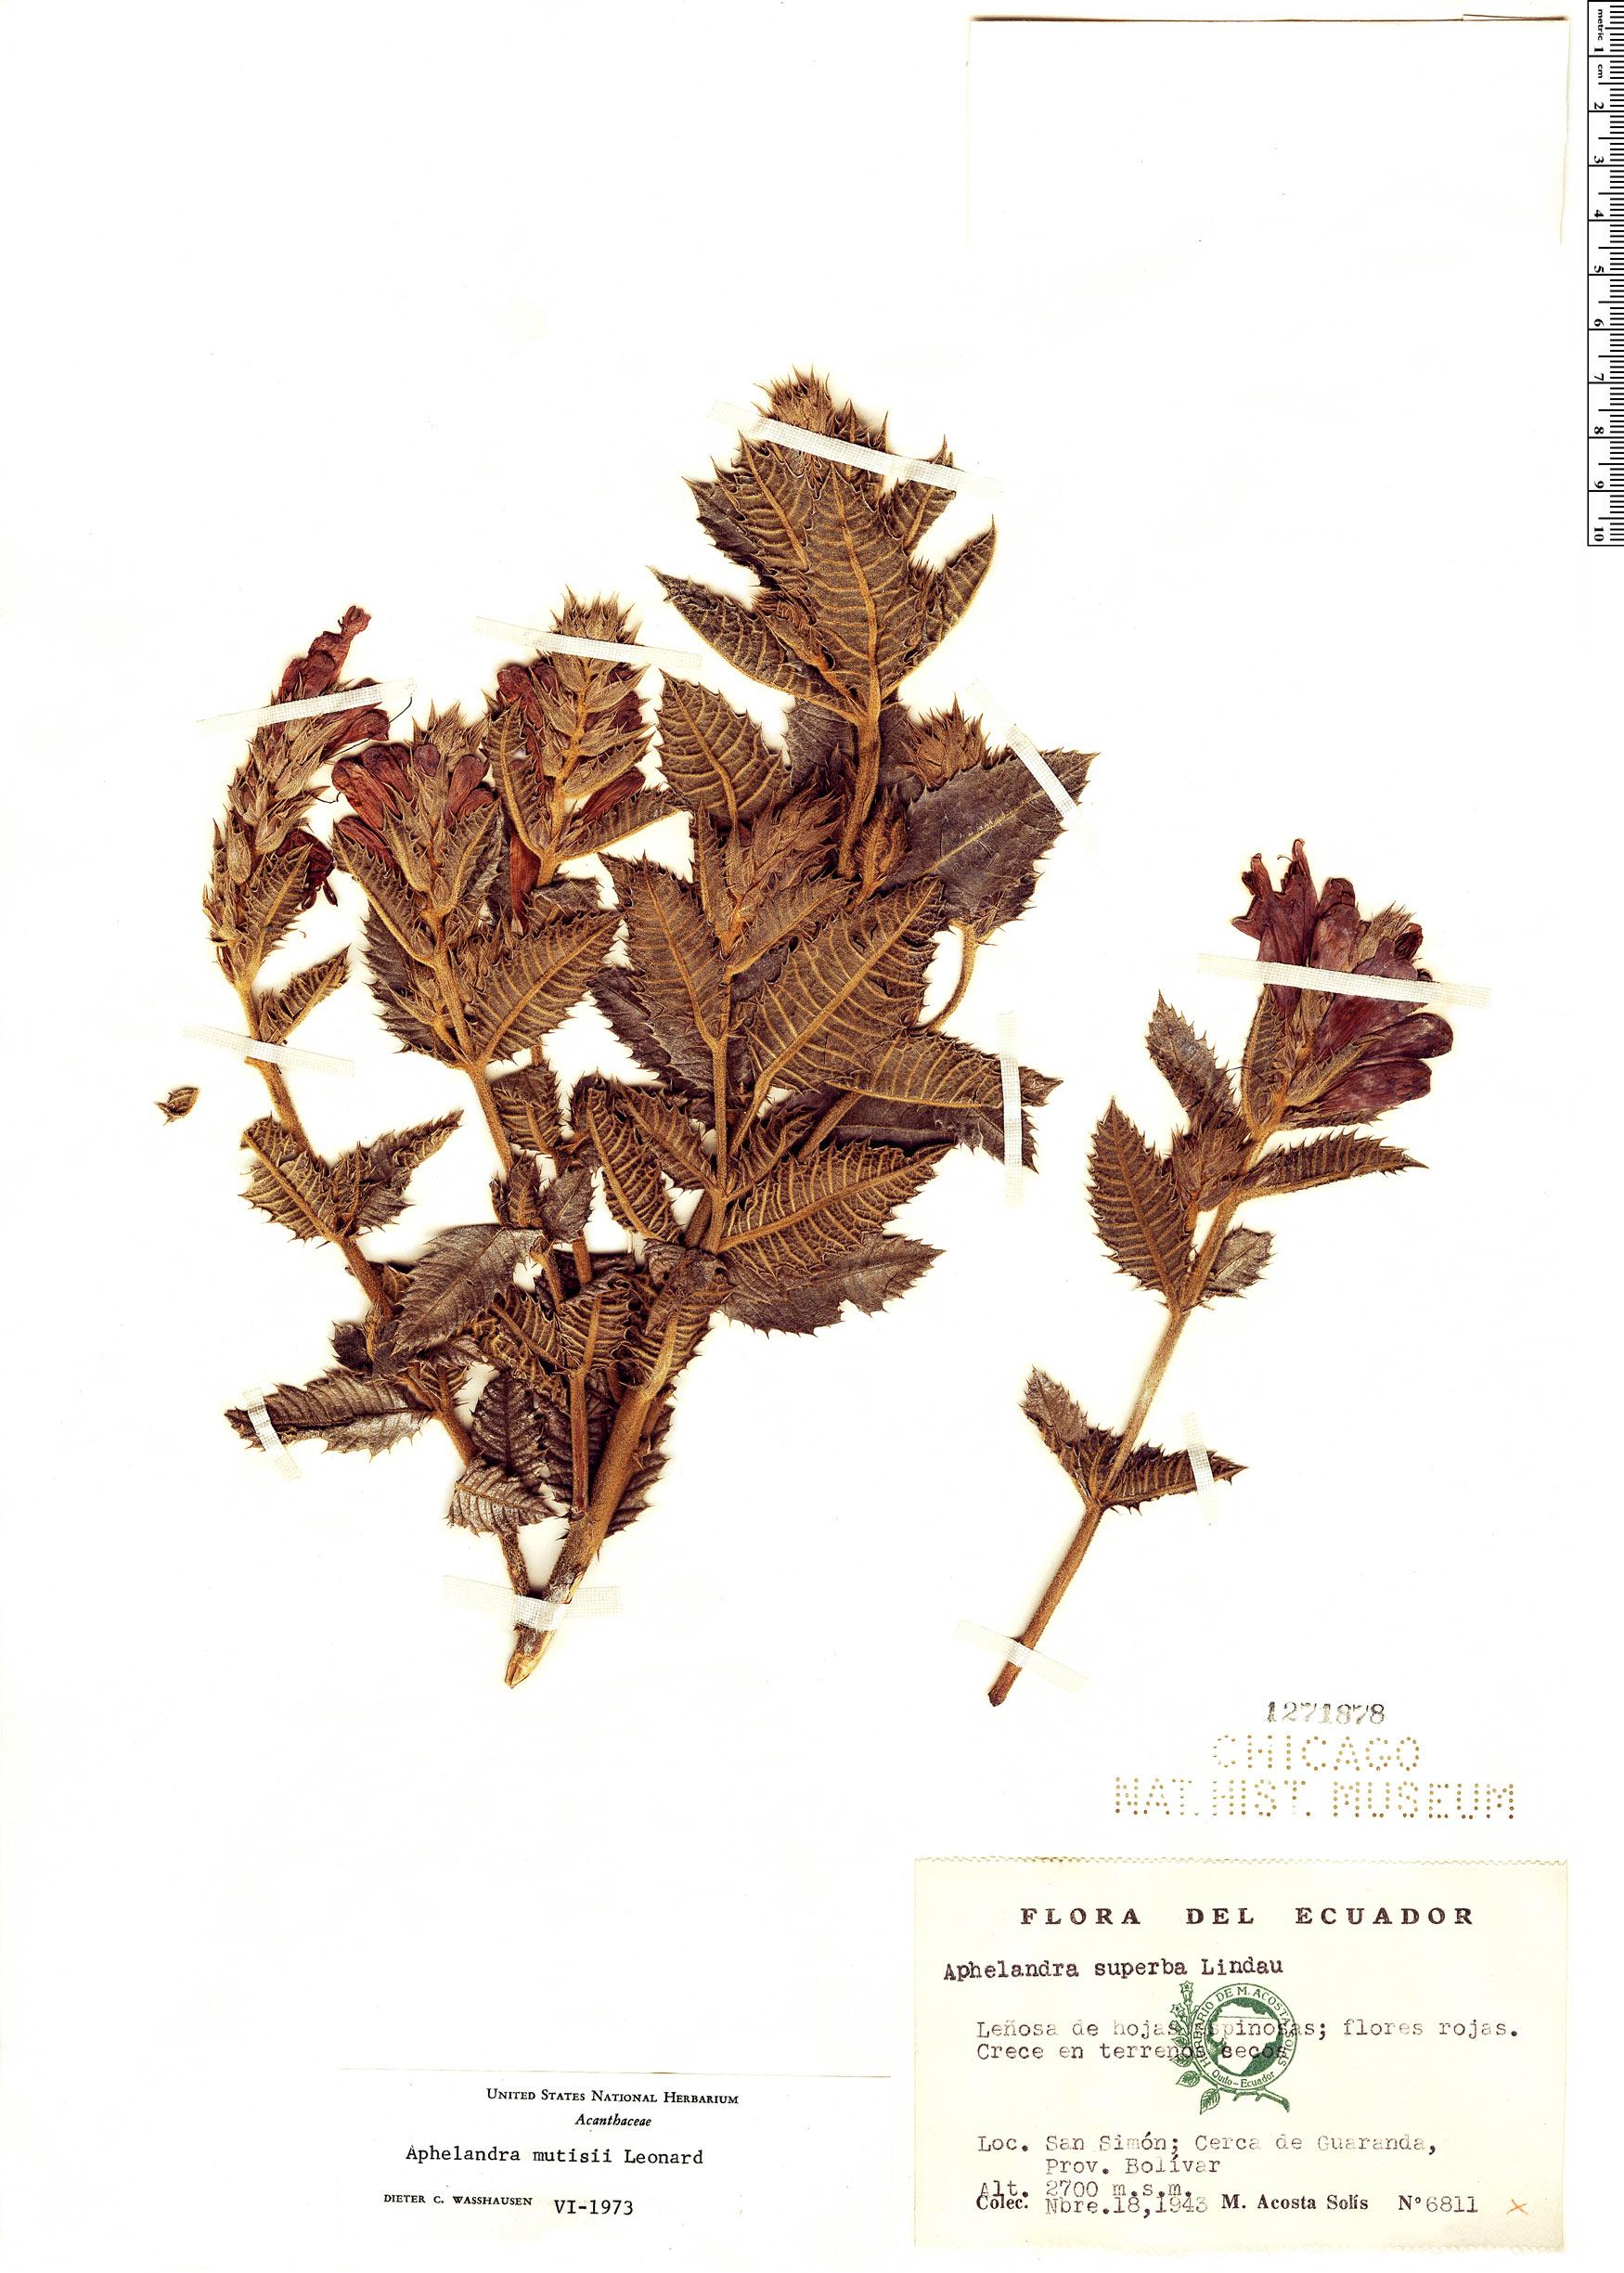 Specimen: Aphelandra formosa